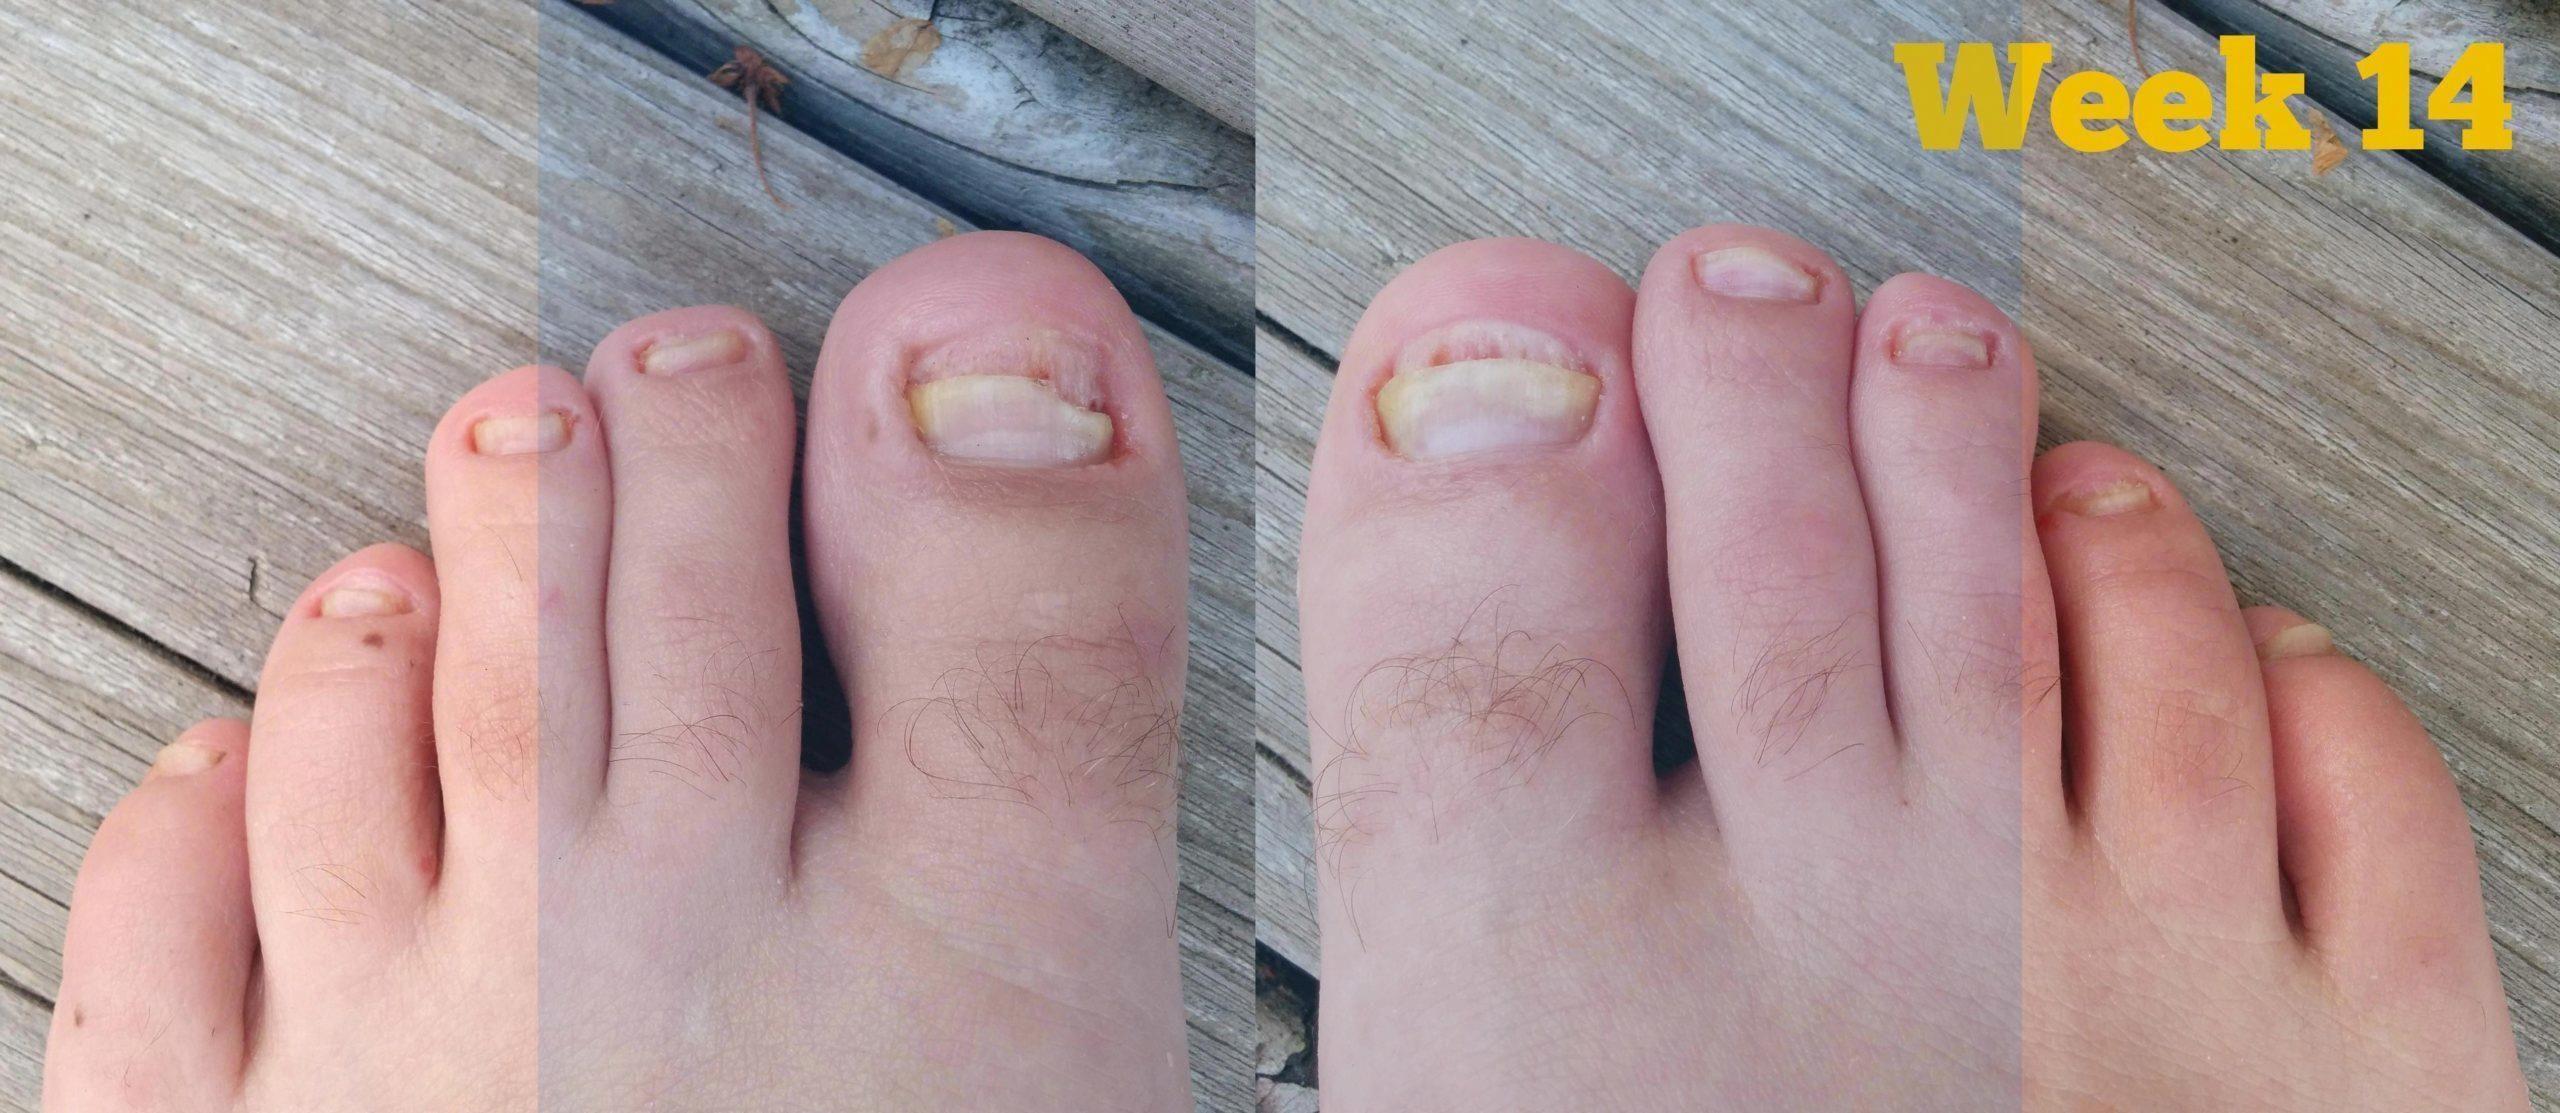 Do Laser Toenail Fungus Treatments Work Funguslasertreatmentreviews Howtorecon Healthy Nails In 2020 Toenail Fungus Remedies Toenail Fungus Toenail Fungus Cure